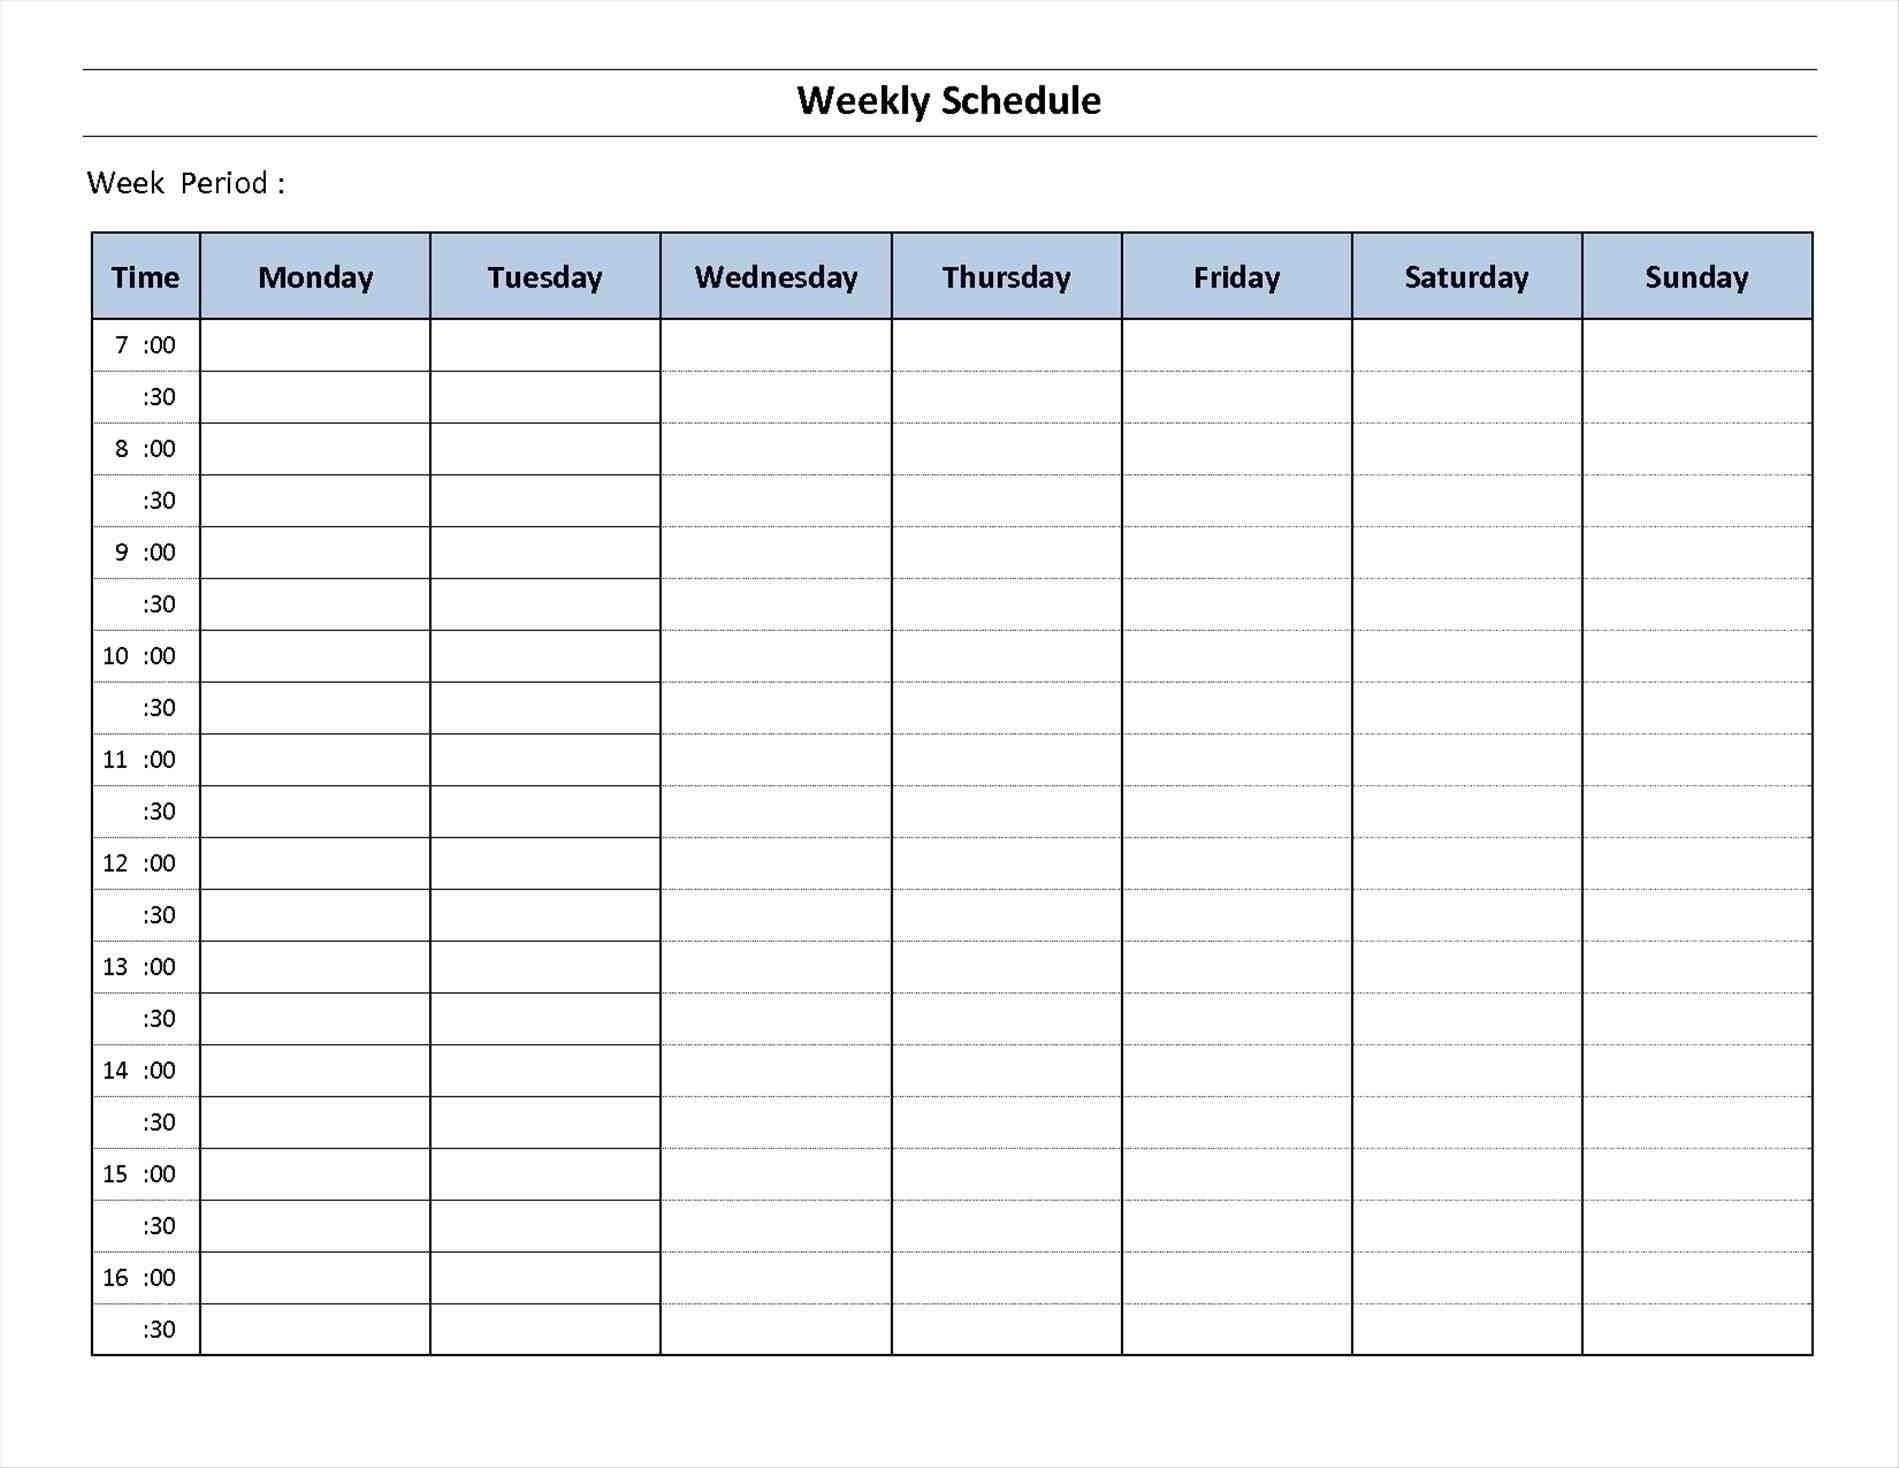 Schedule Template Ay Planner Week Calendar Printable Excel Word Free pertaining to Weekly Calendar Template 7 Day